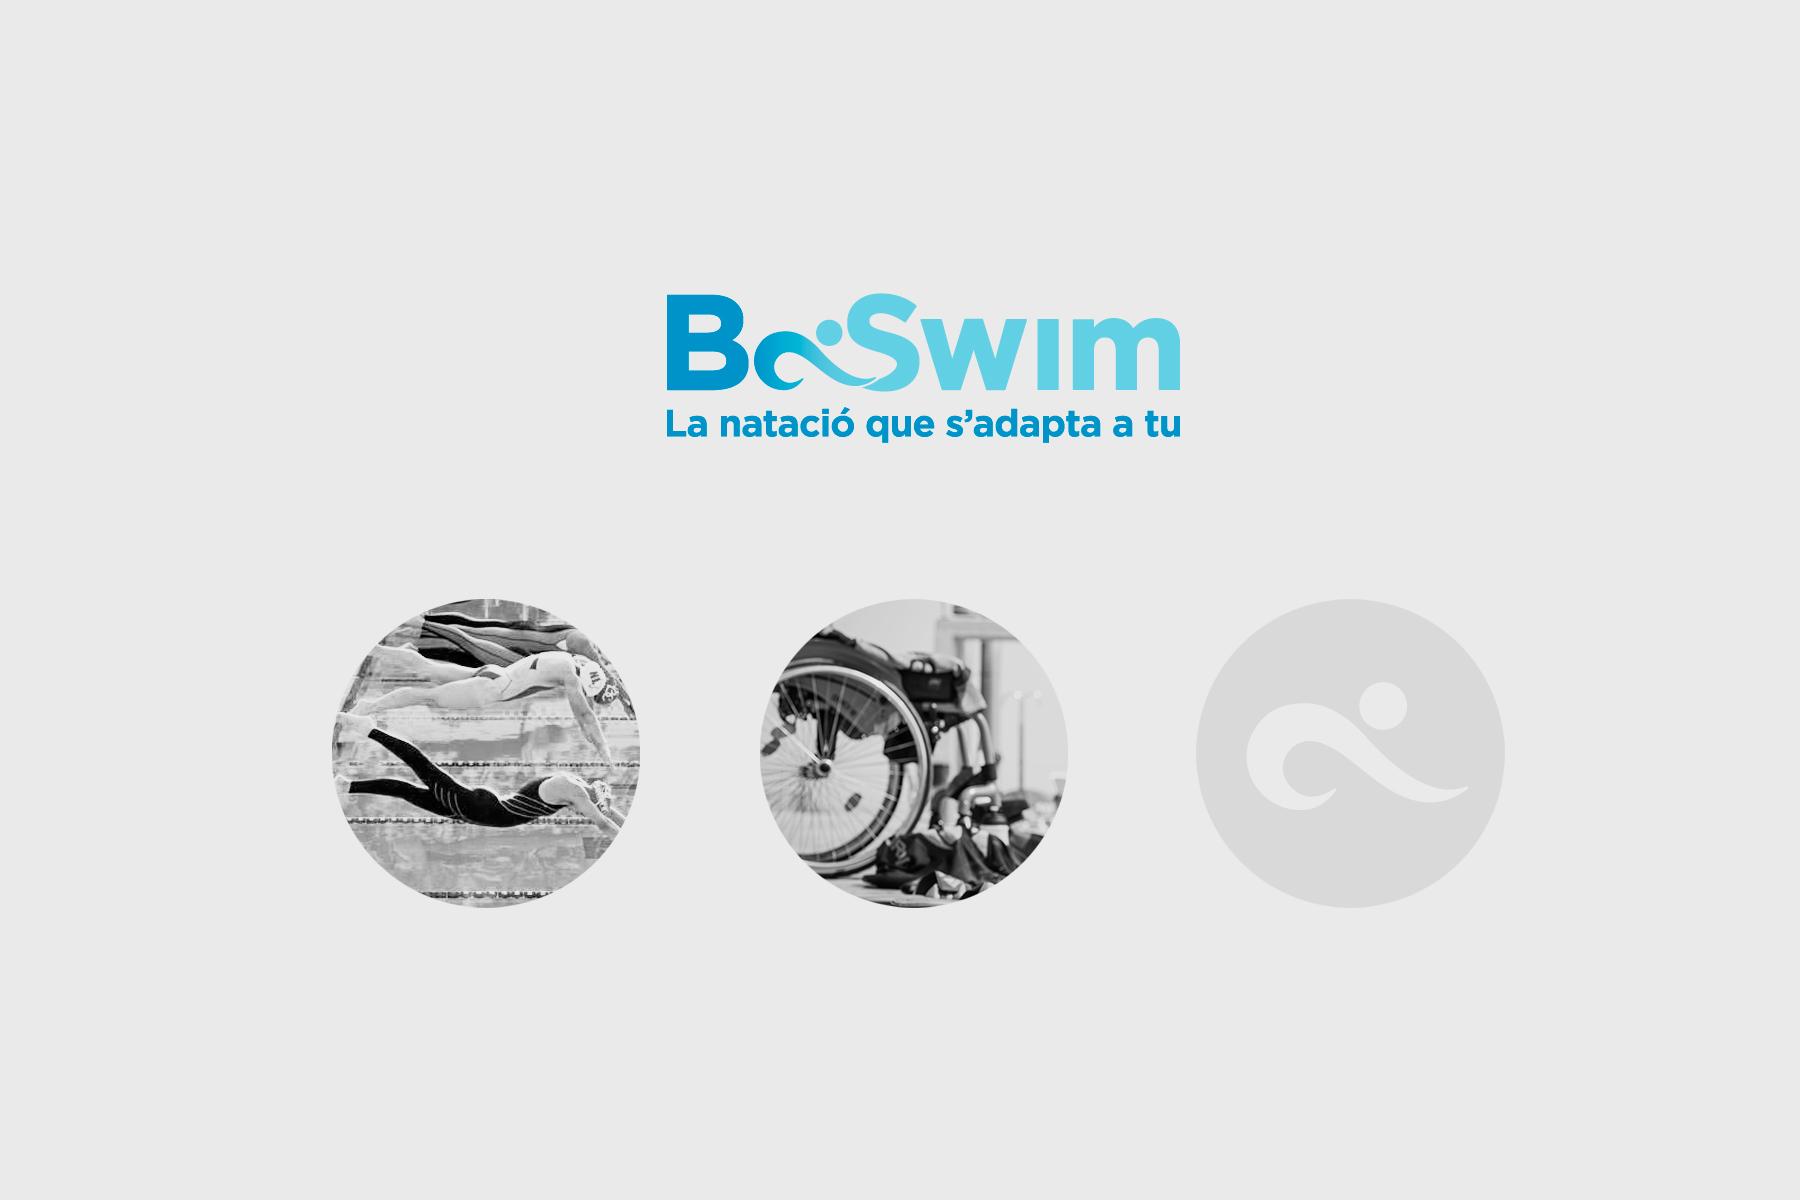 bswim-simbolo